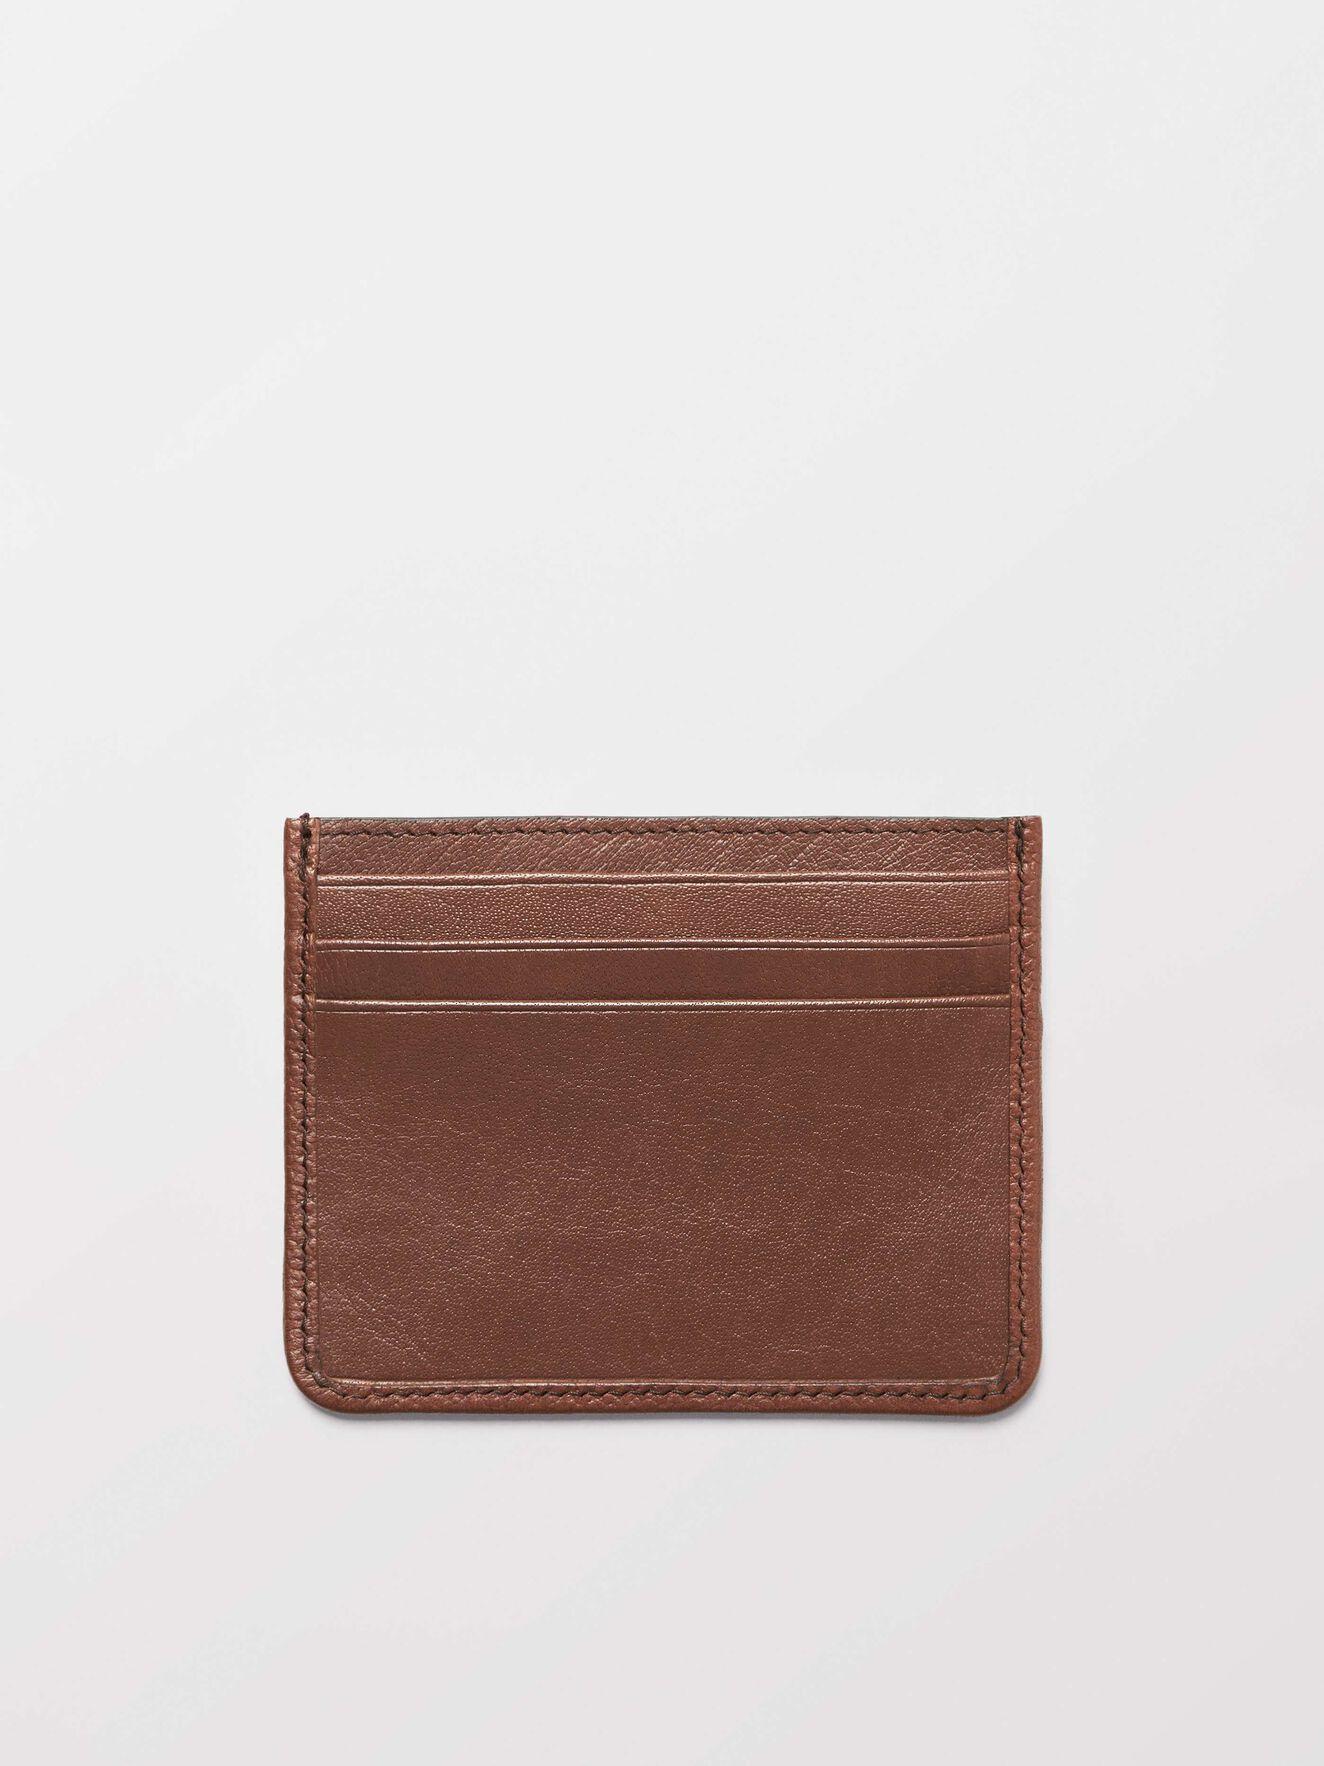 Gleizes Card Holder in Medium Brown from Tiger of Sweden